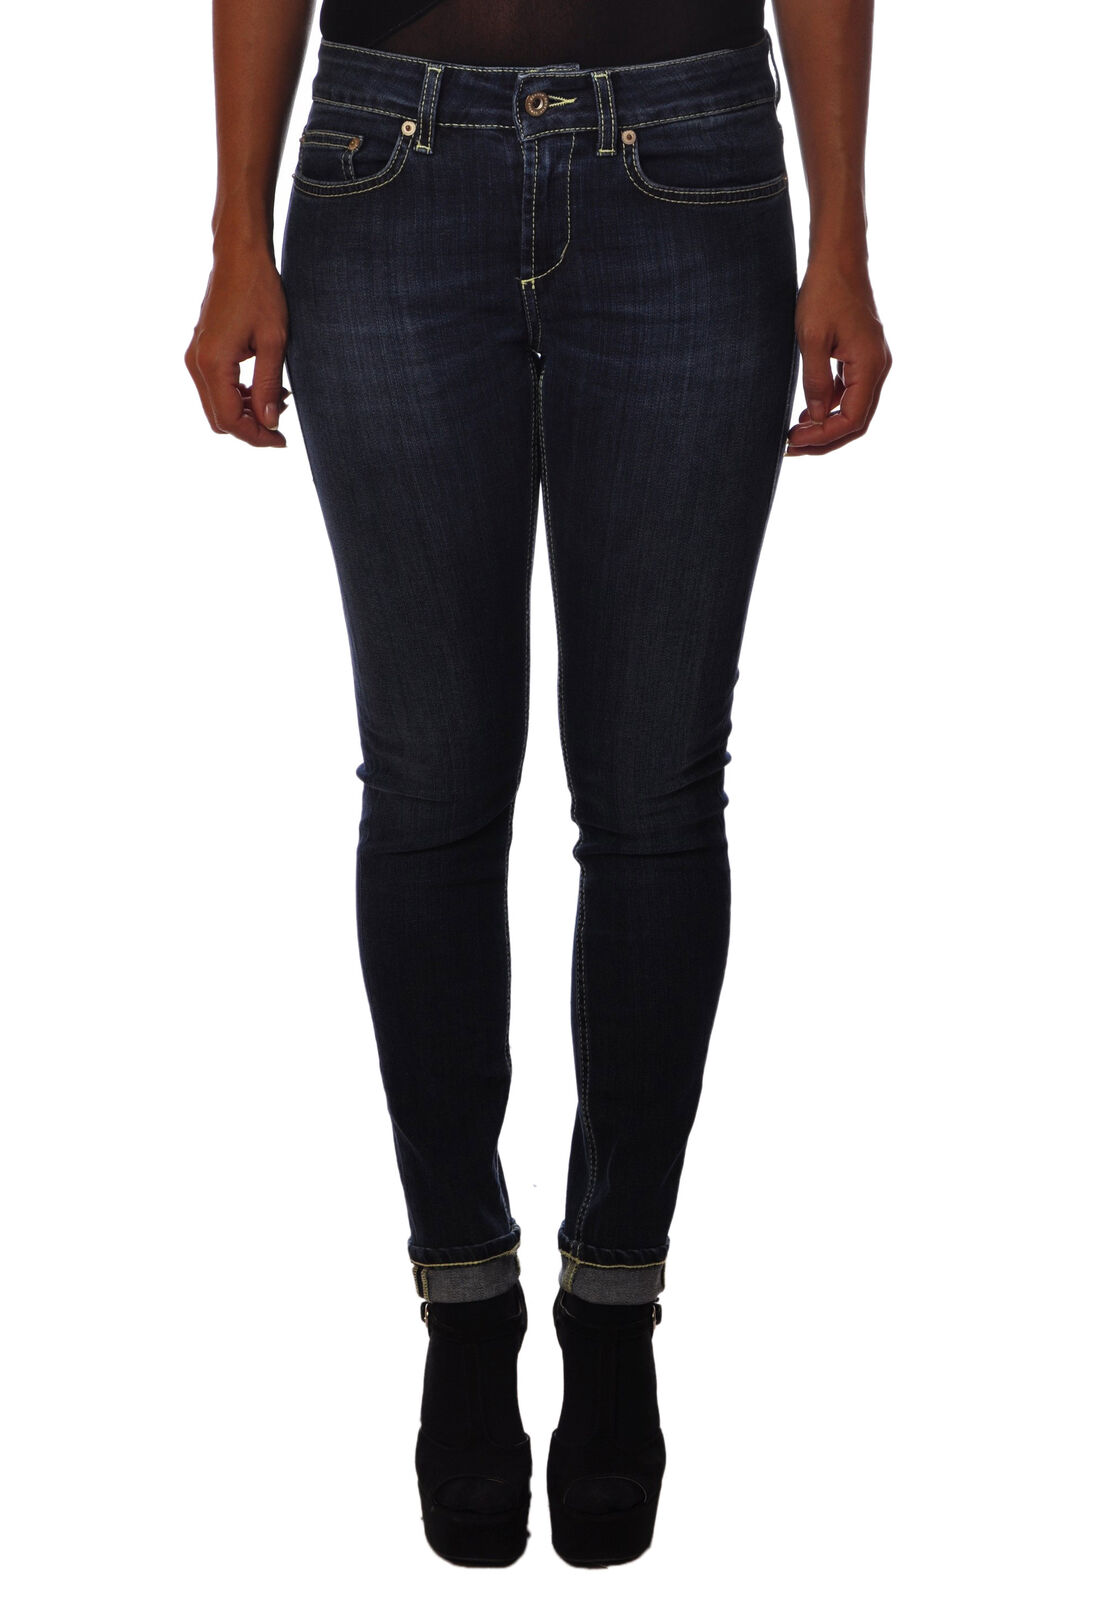 Dondup  -  Pants - Female - Denim - 2660928N173905